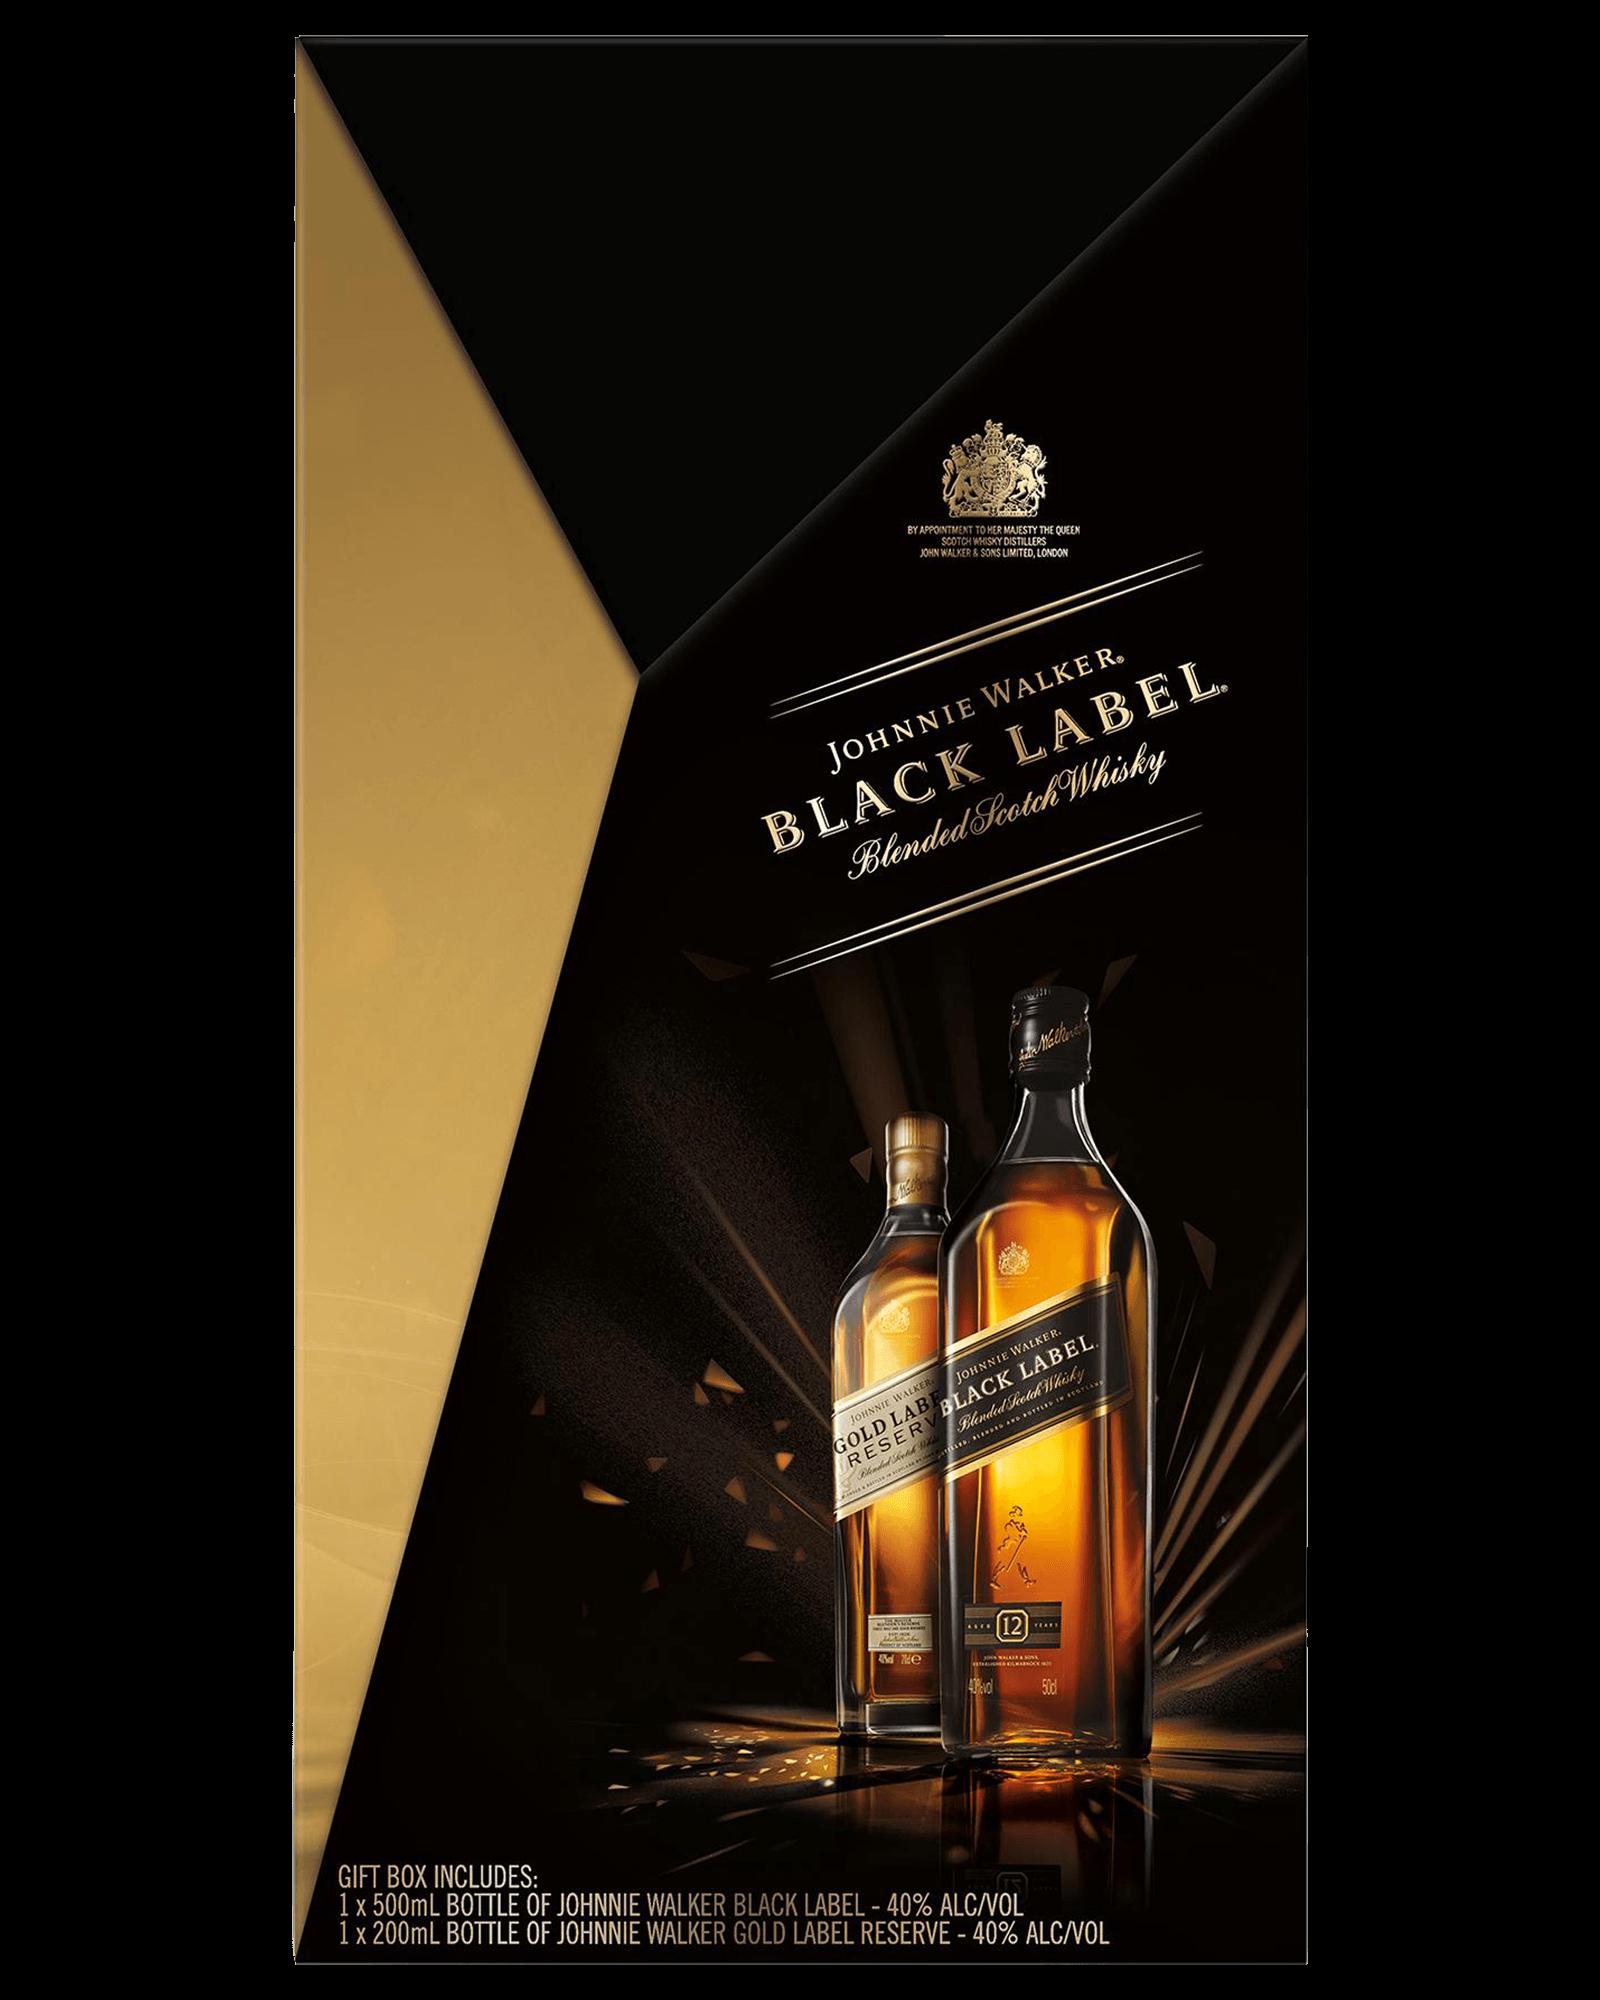 Johnnie Walker Black & Gold Label Scotch Whisky Gift Pack